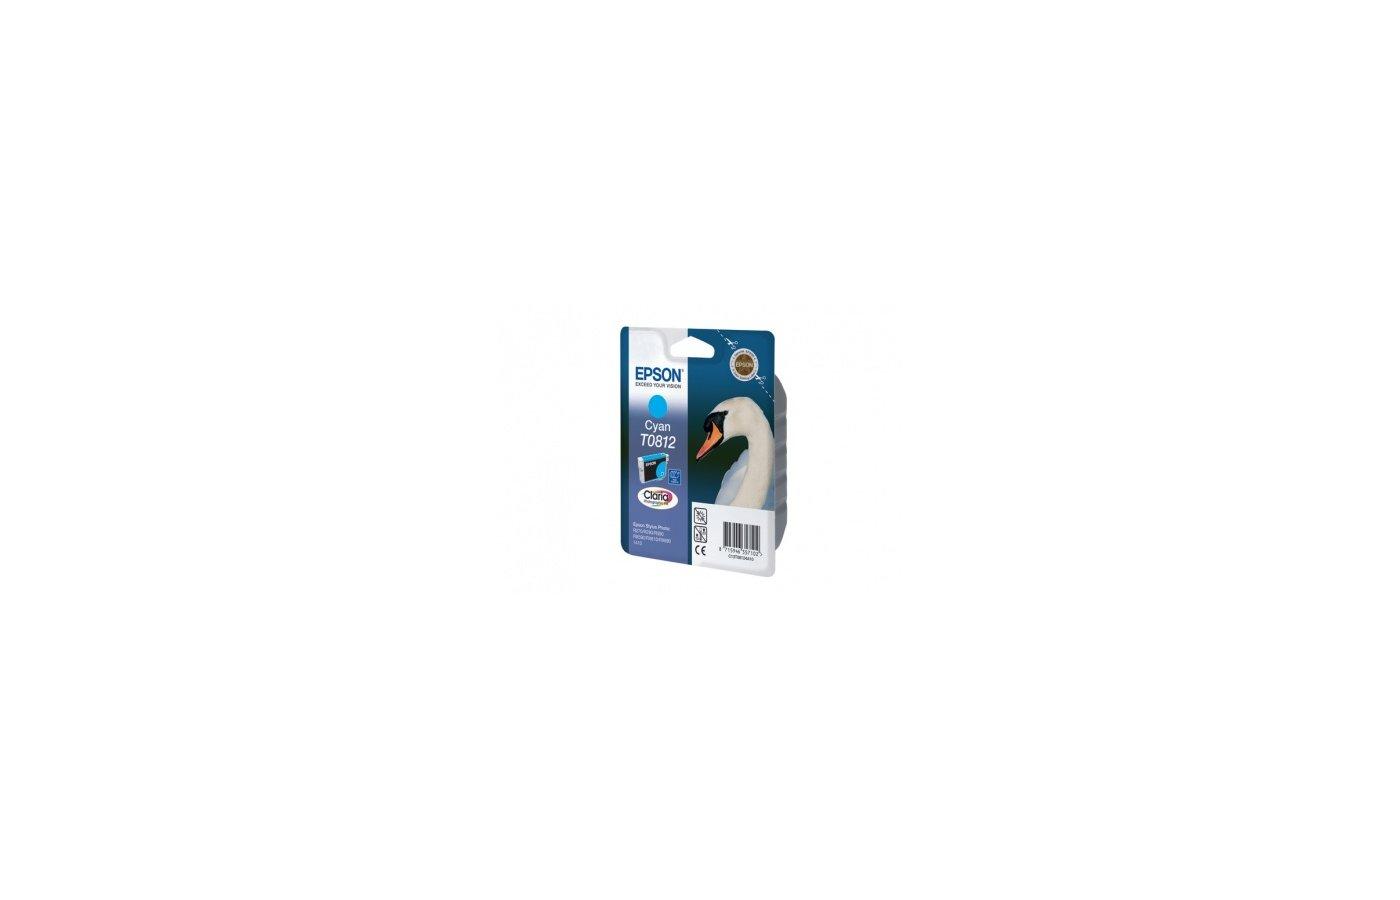 Картридж струйный Epson C13T11124A10 T0812 голубой R270/290/RX590 (замена C13T08124A)